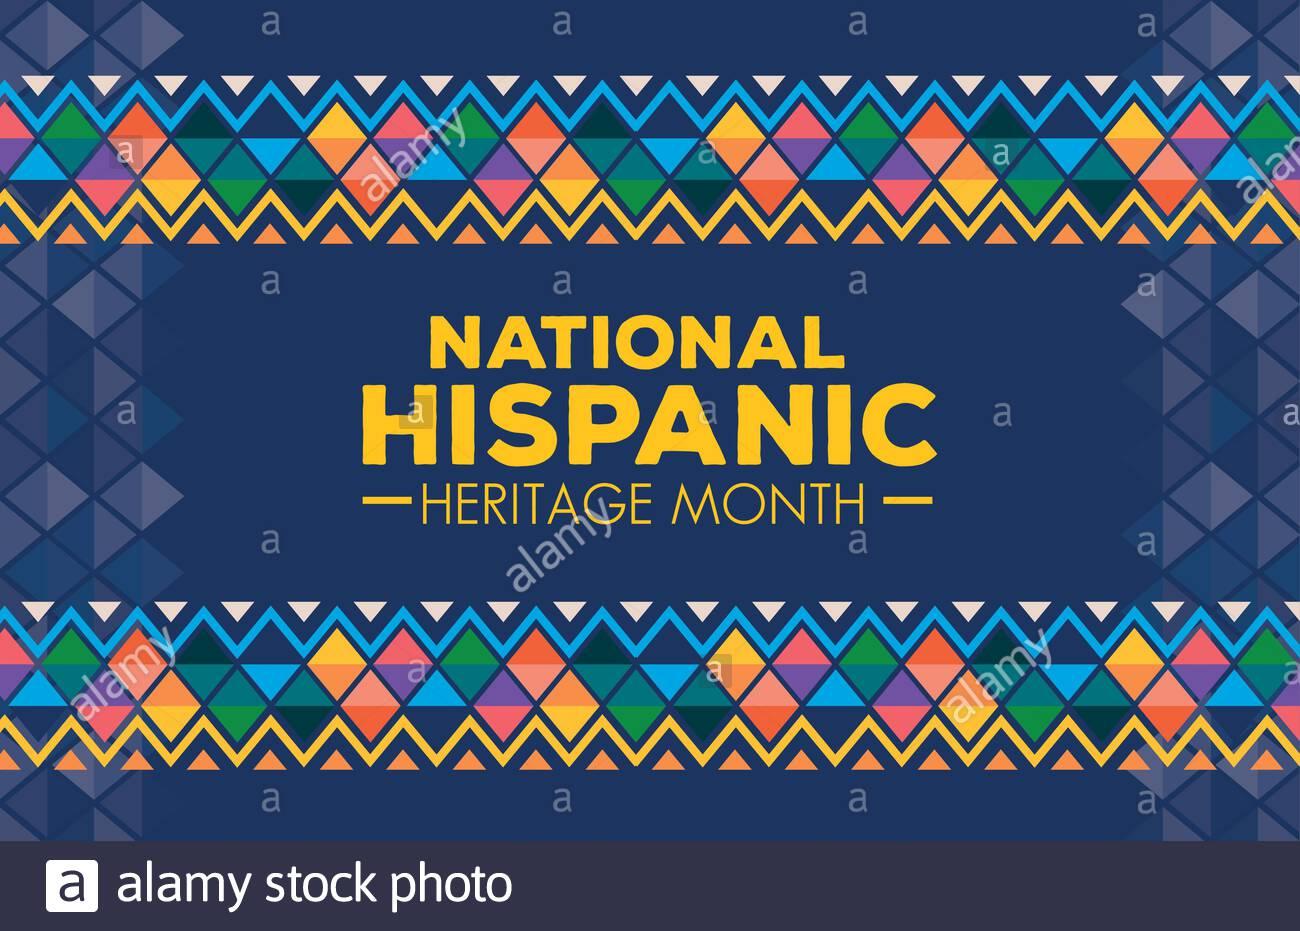 hispanic and latino americans culture national hispanic heritage 1300x931